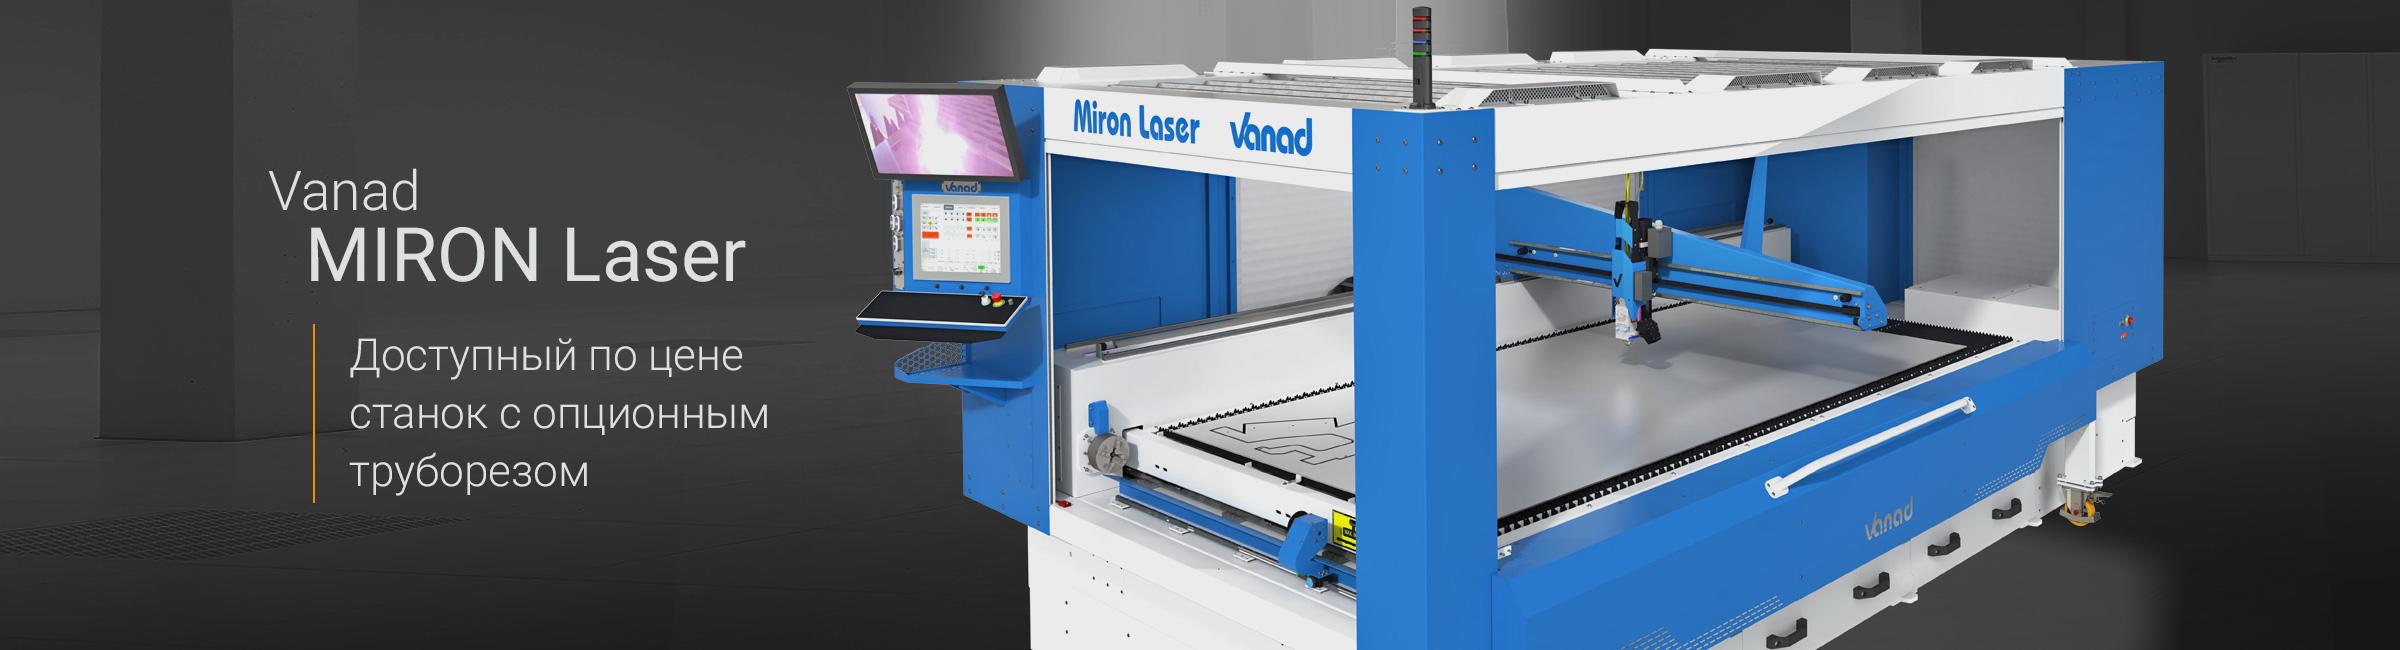 Miron Laser - ru